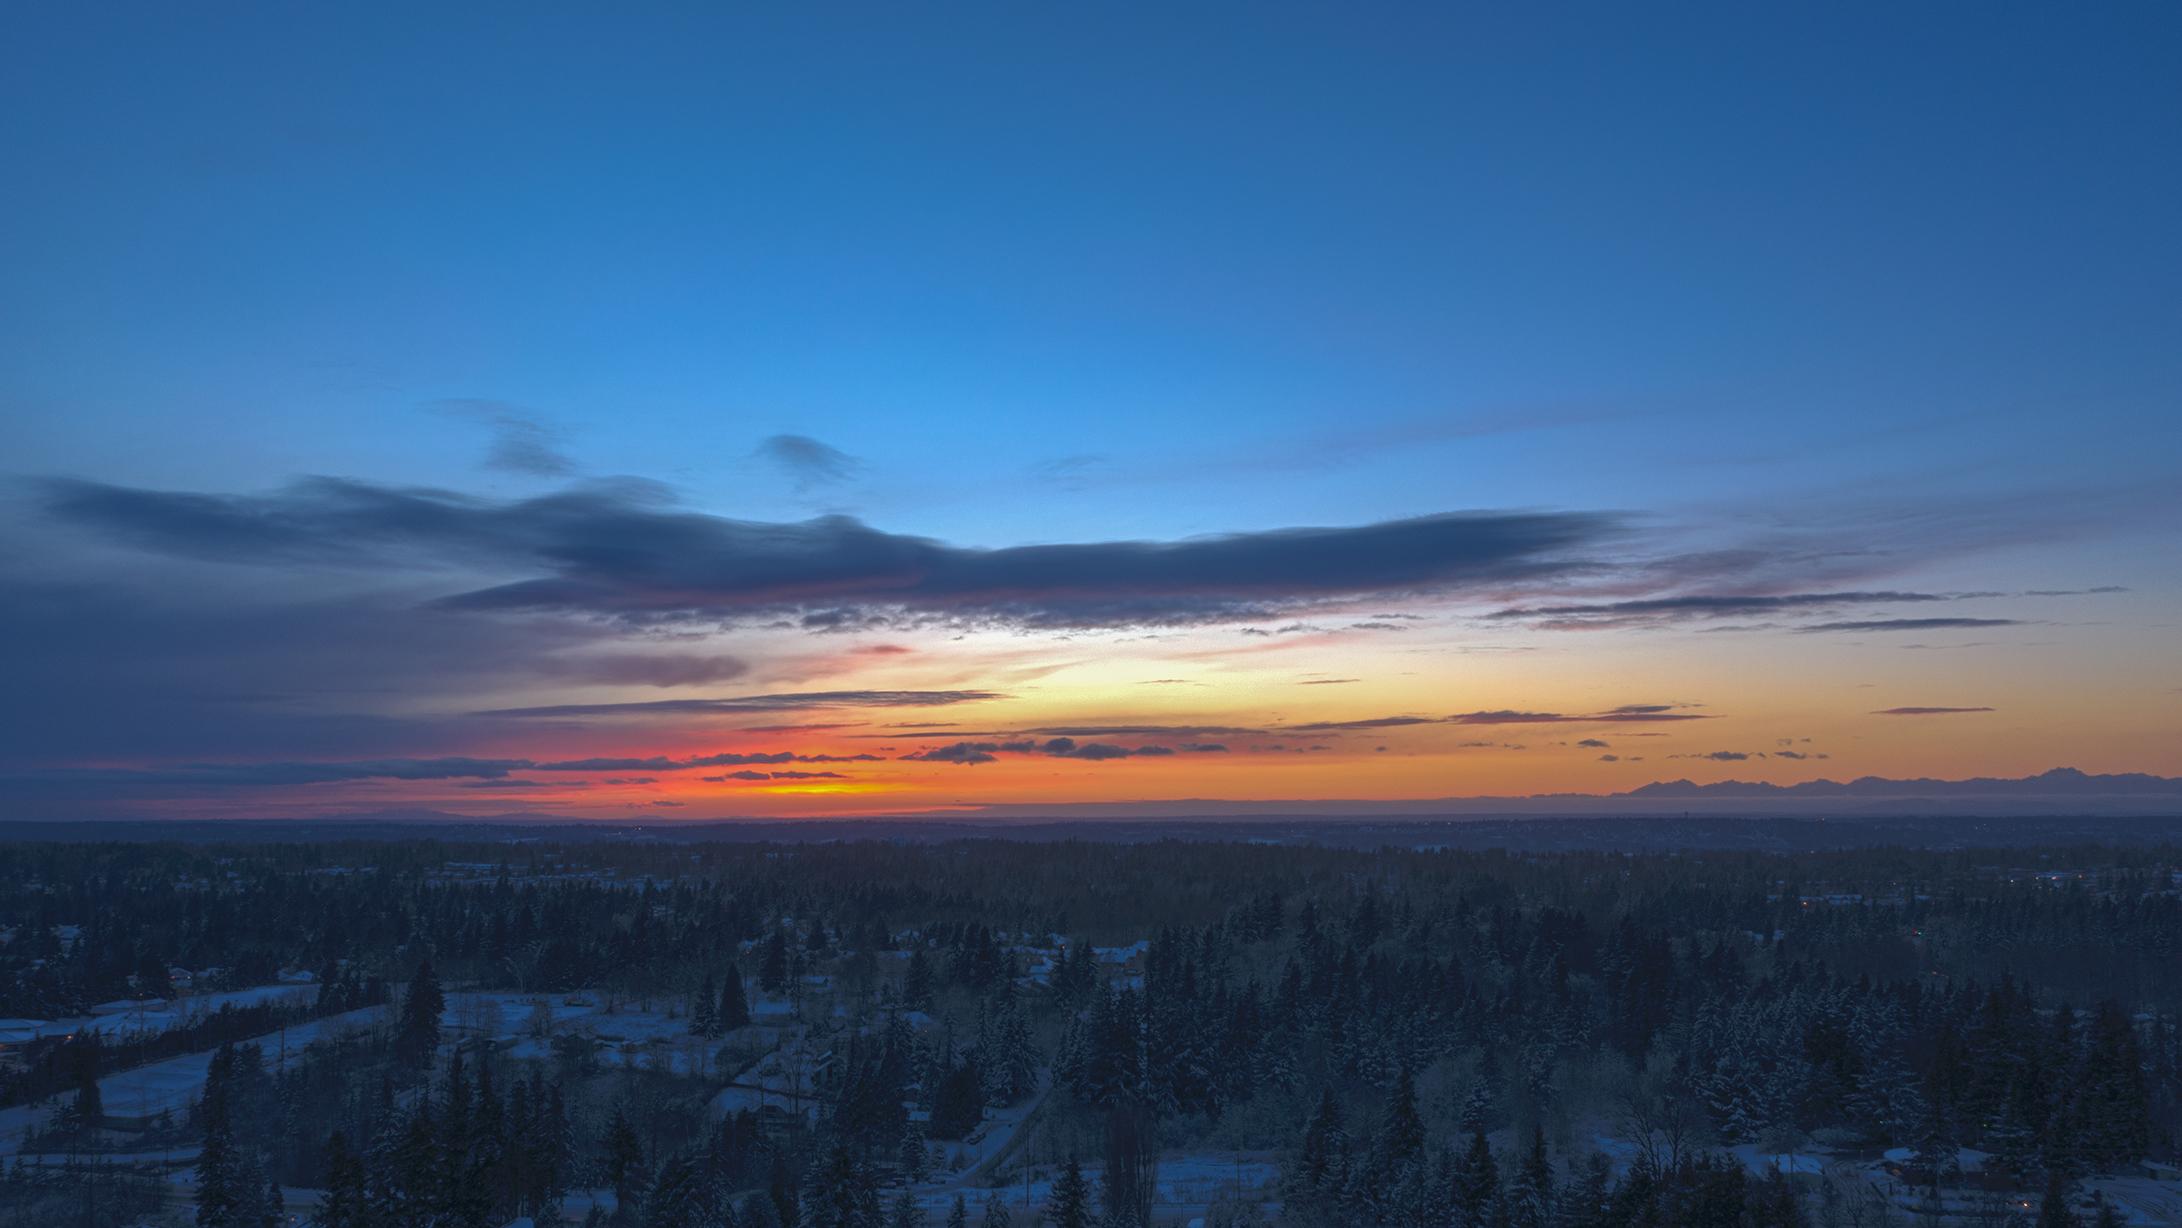 02_04_2019_Backyard_Snow_Sunset_03_SMALL.jpg